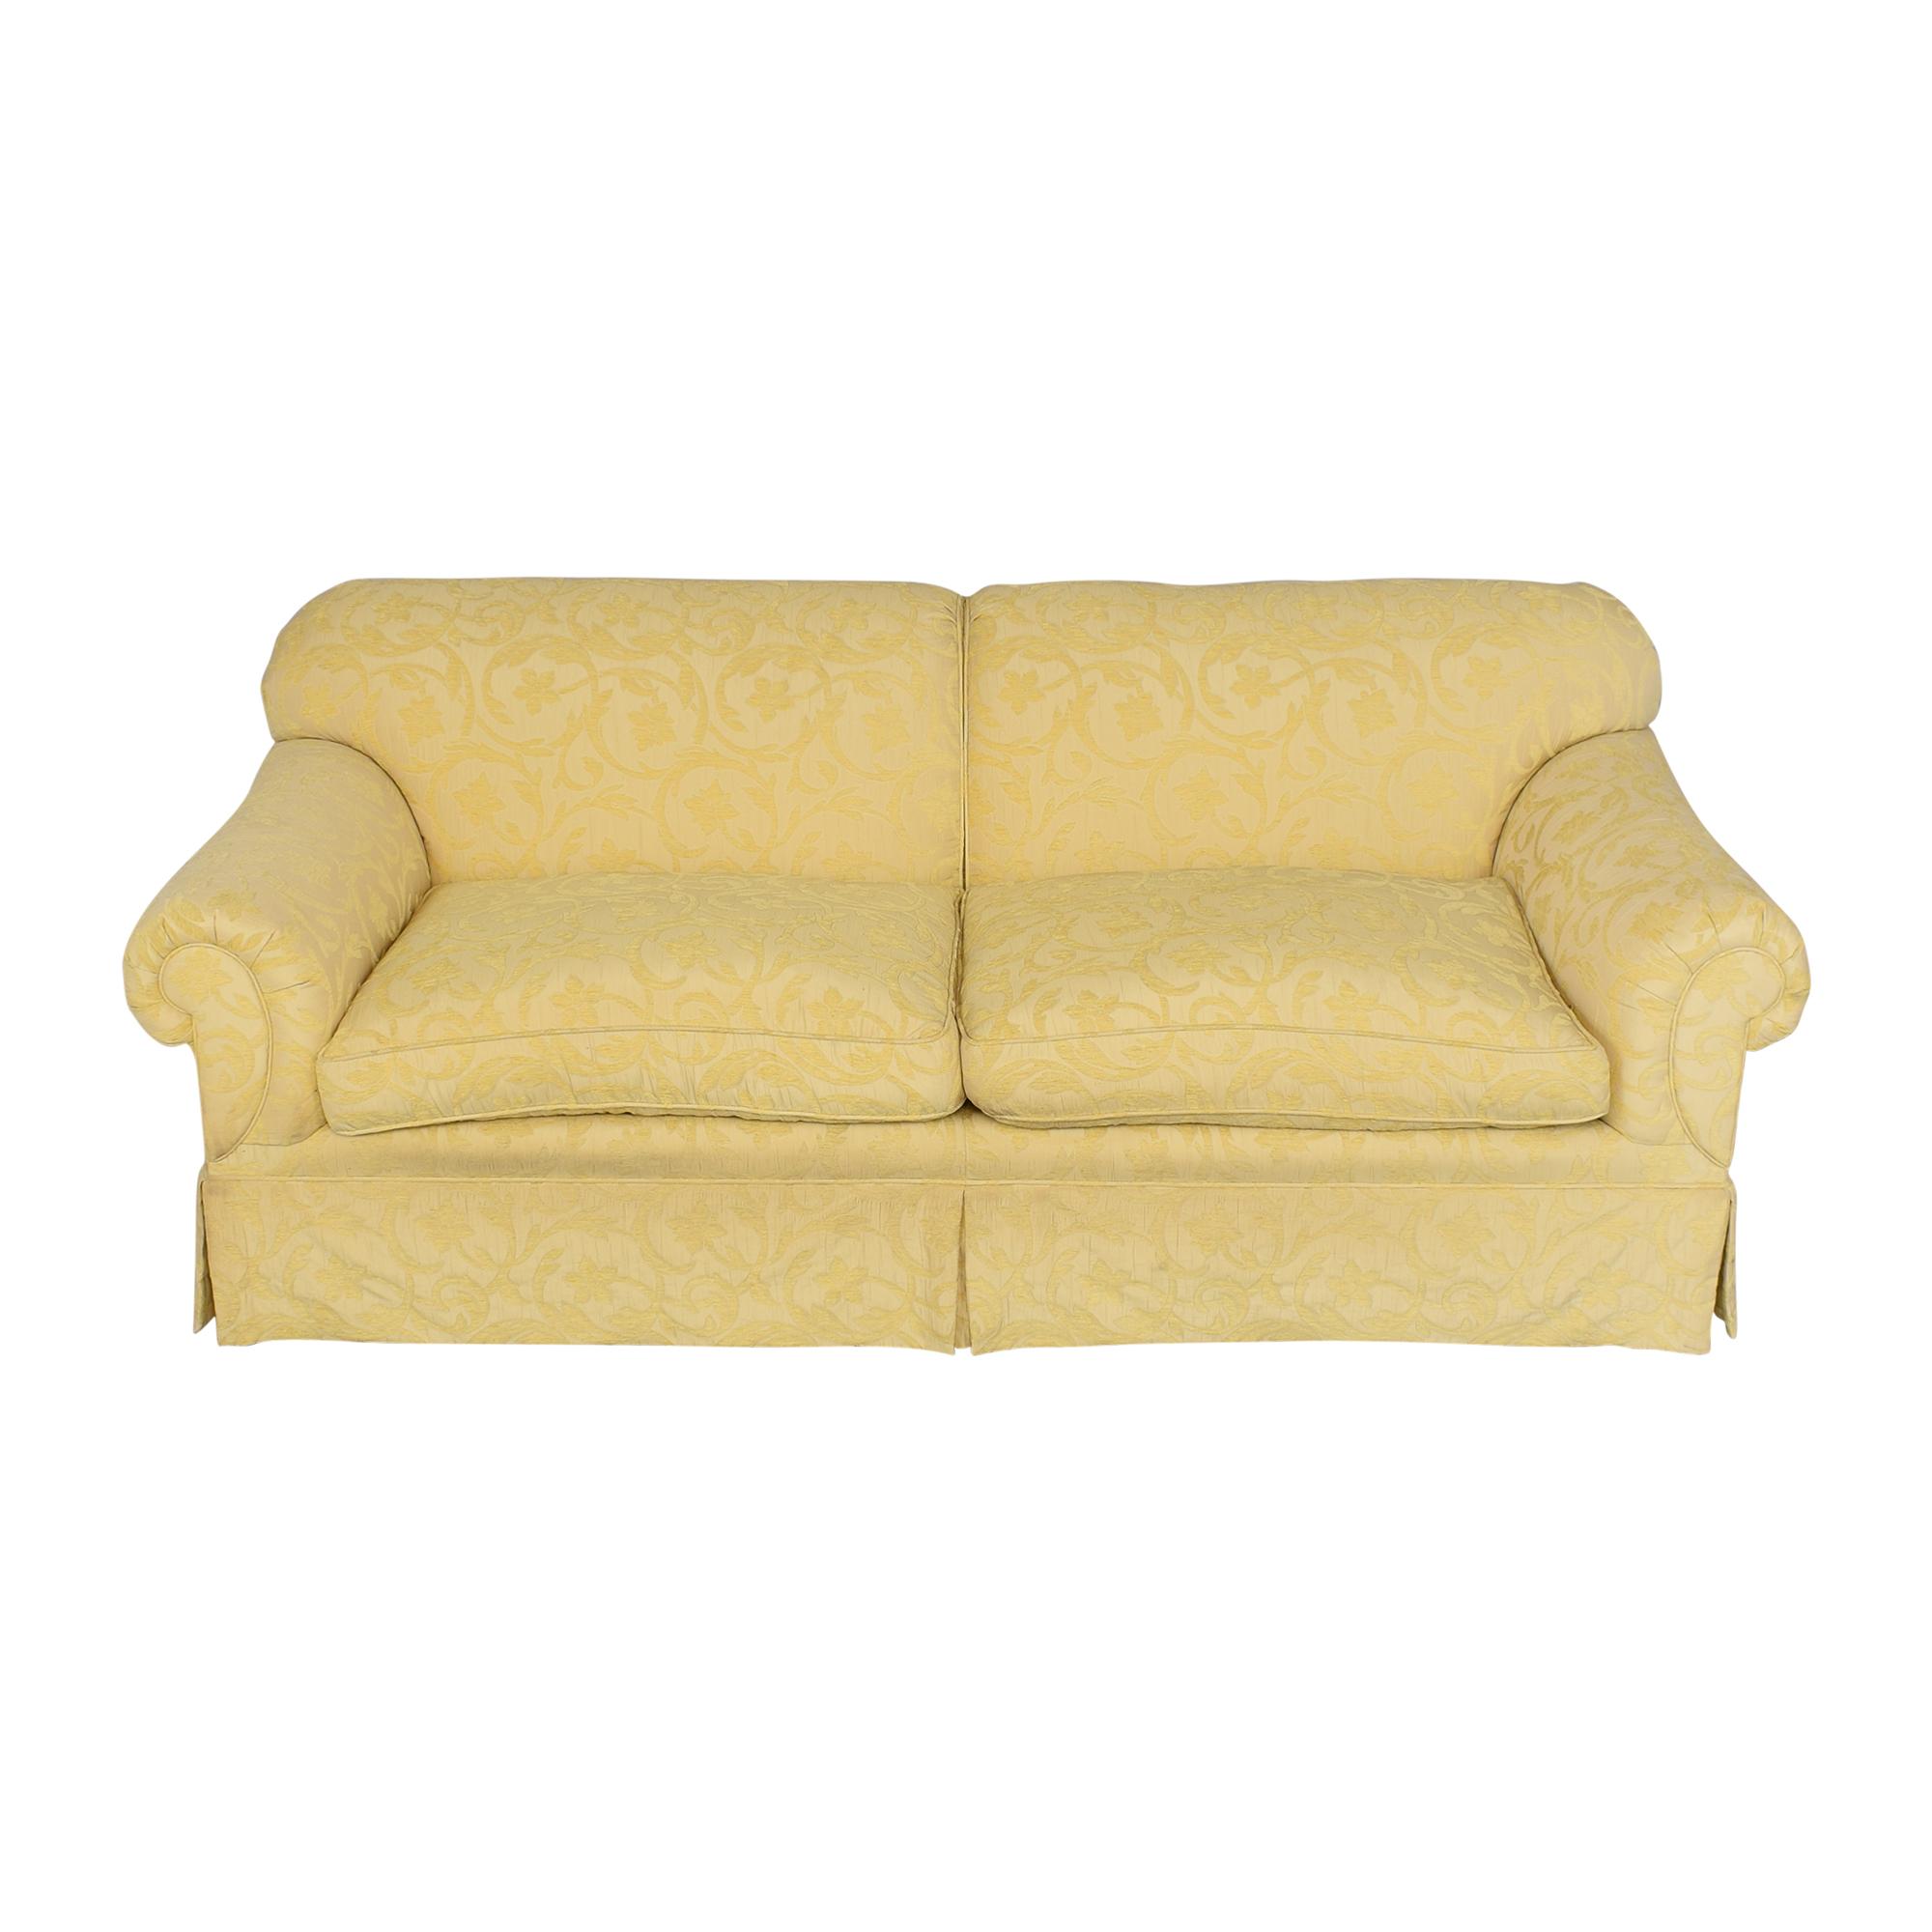 Lee Jofa Lee Jofa Two Cushion Sofa price